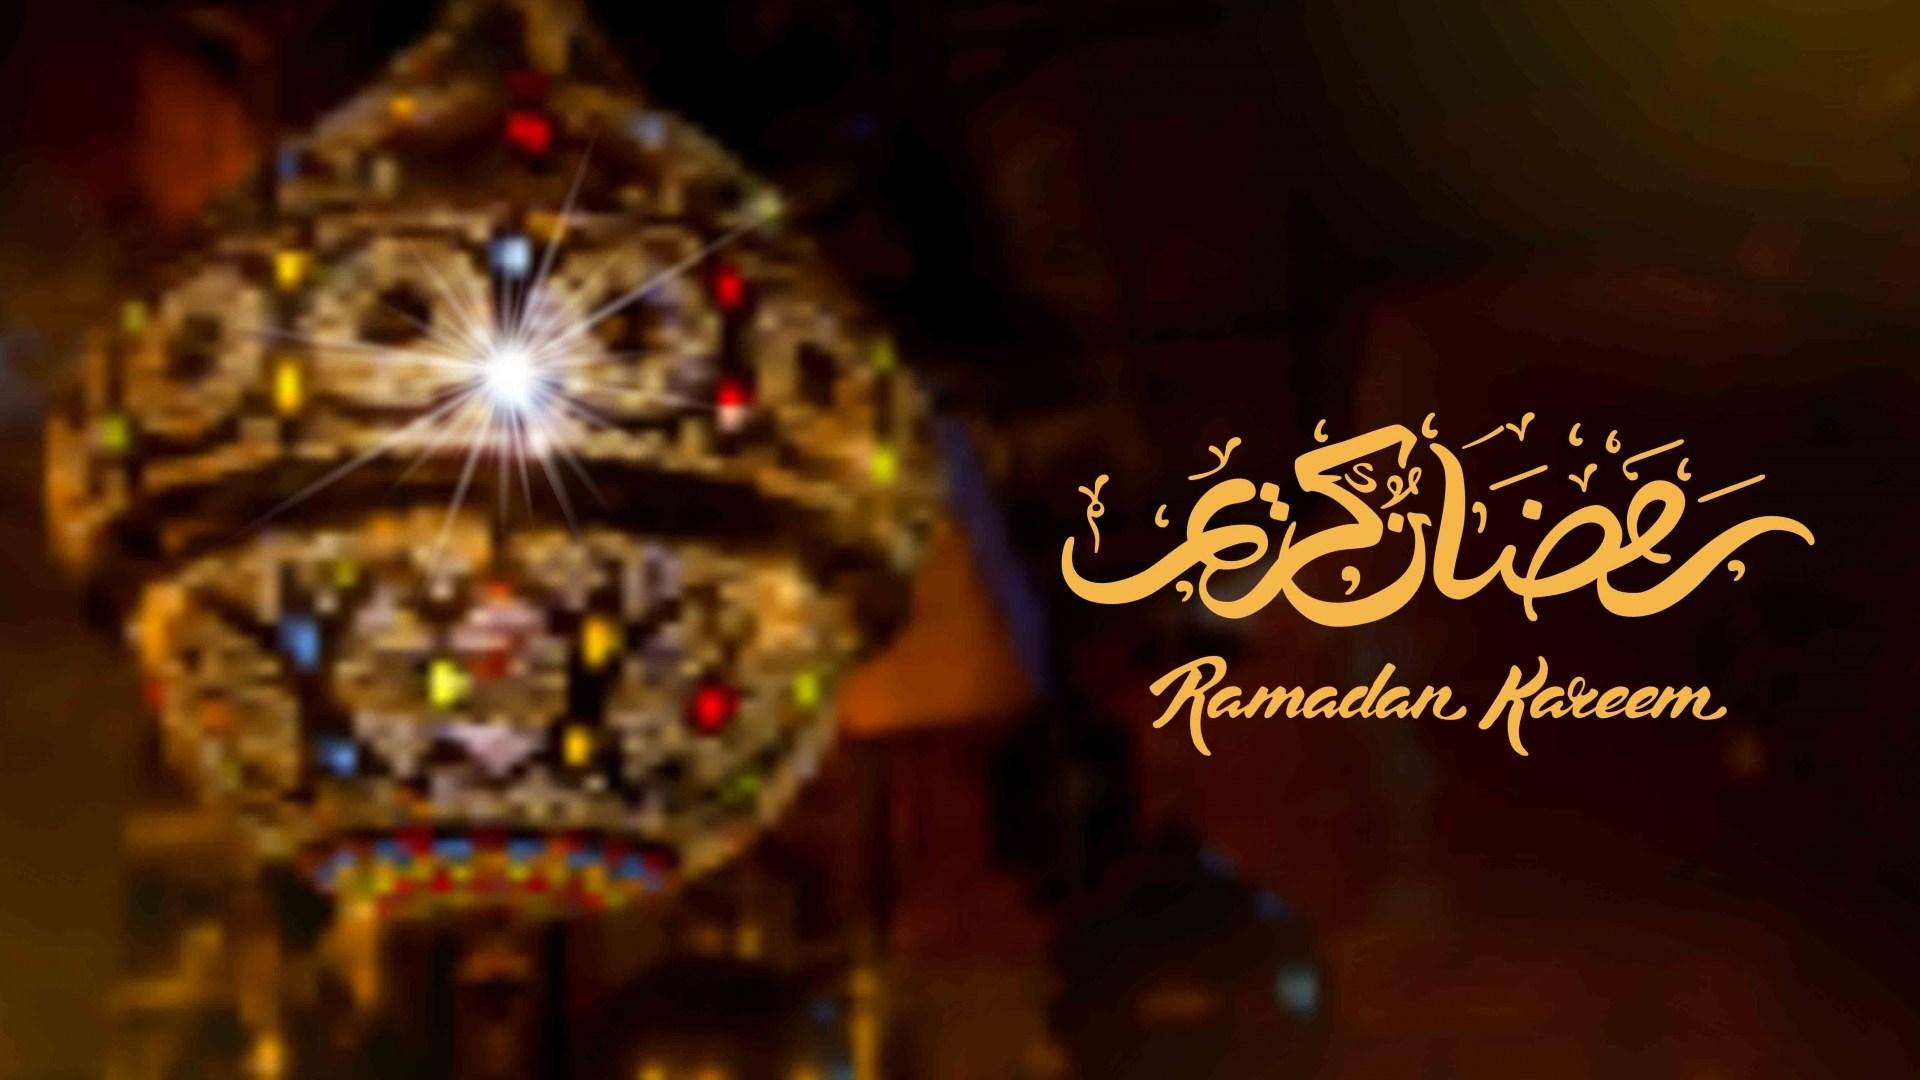 Ramadan Kareem Wallpapers| - My Site